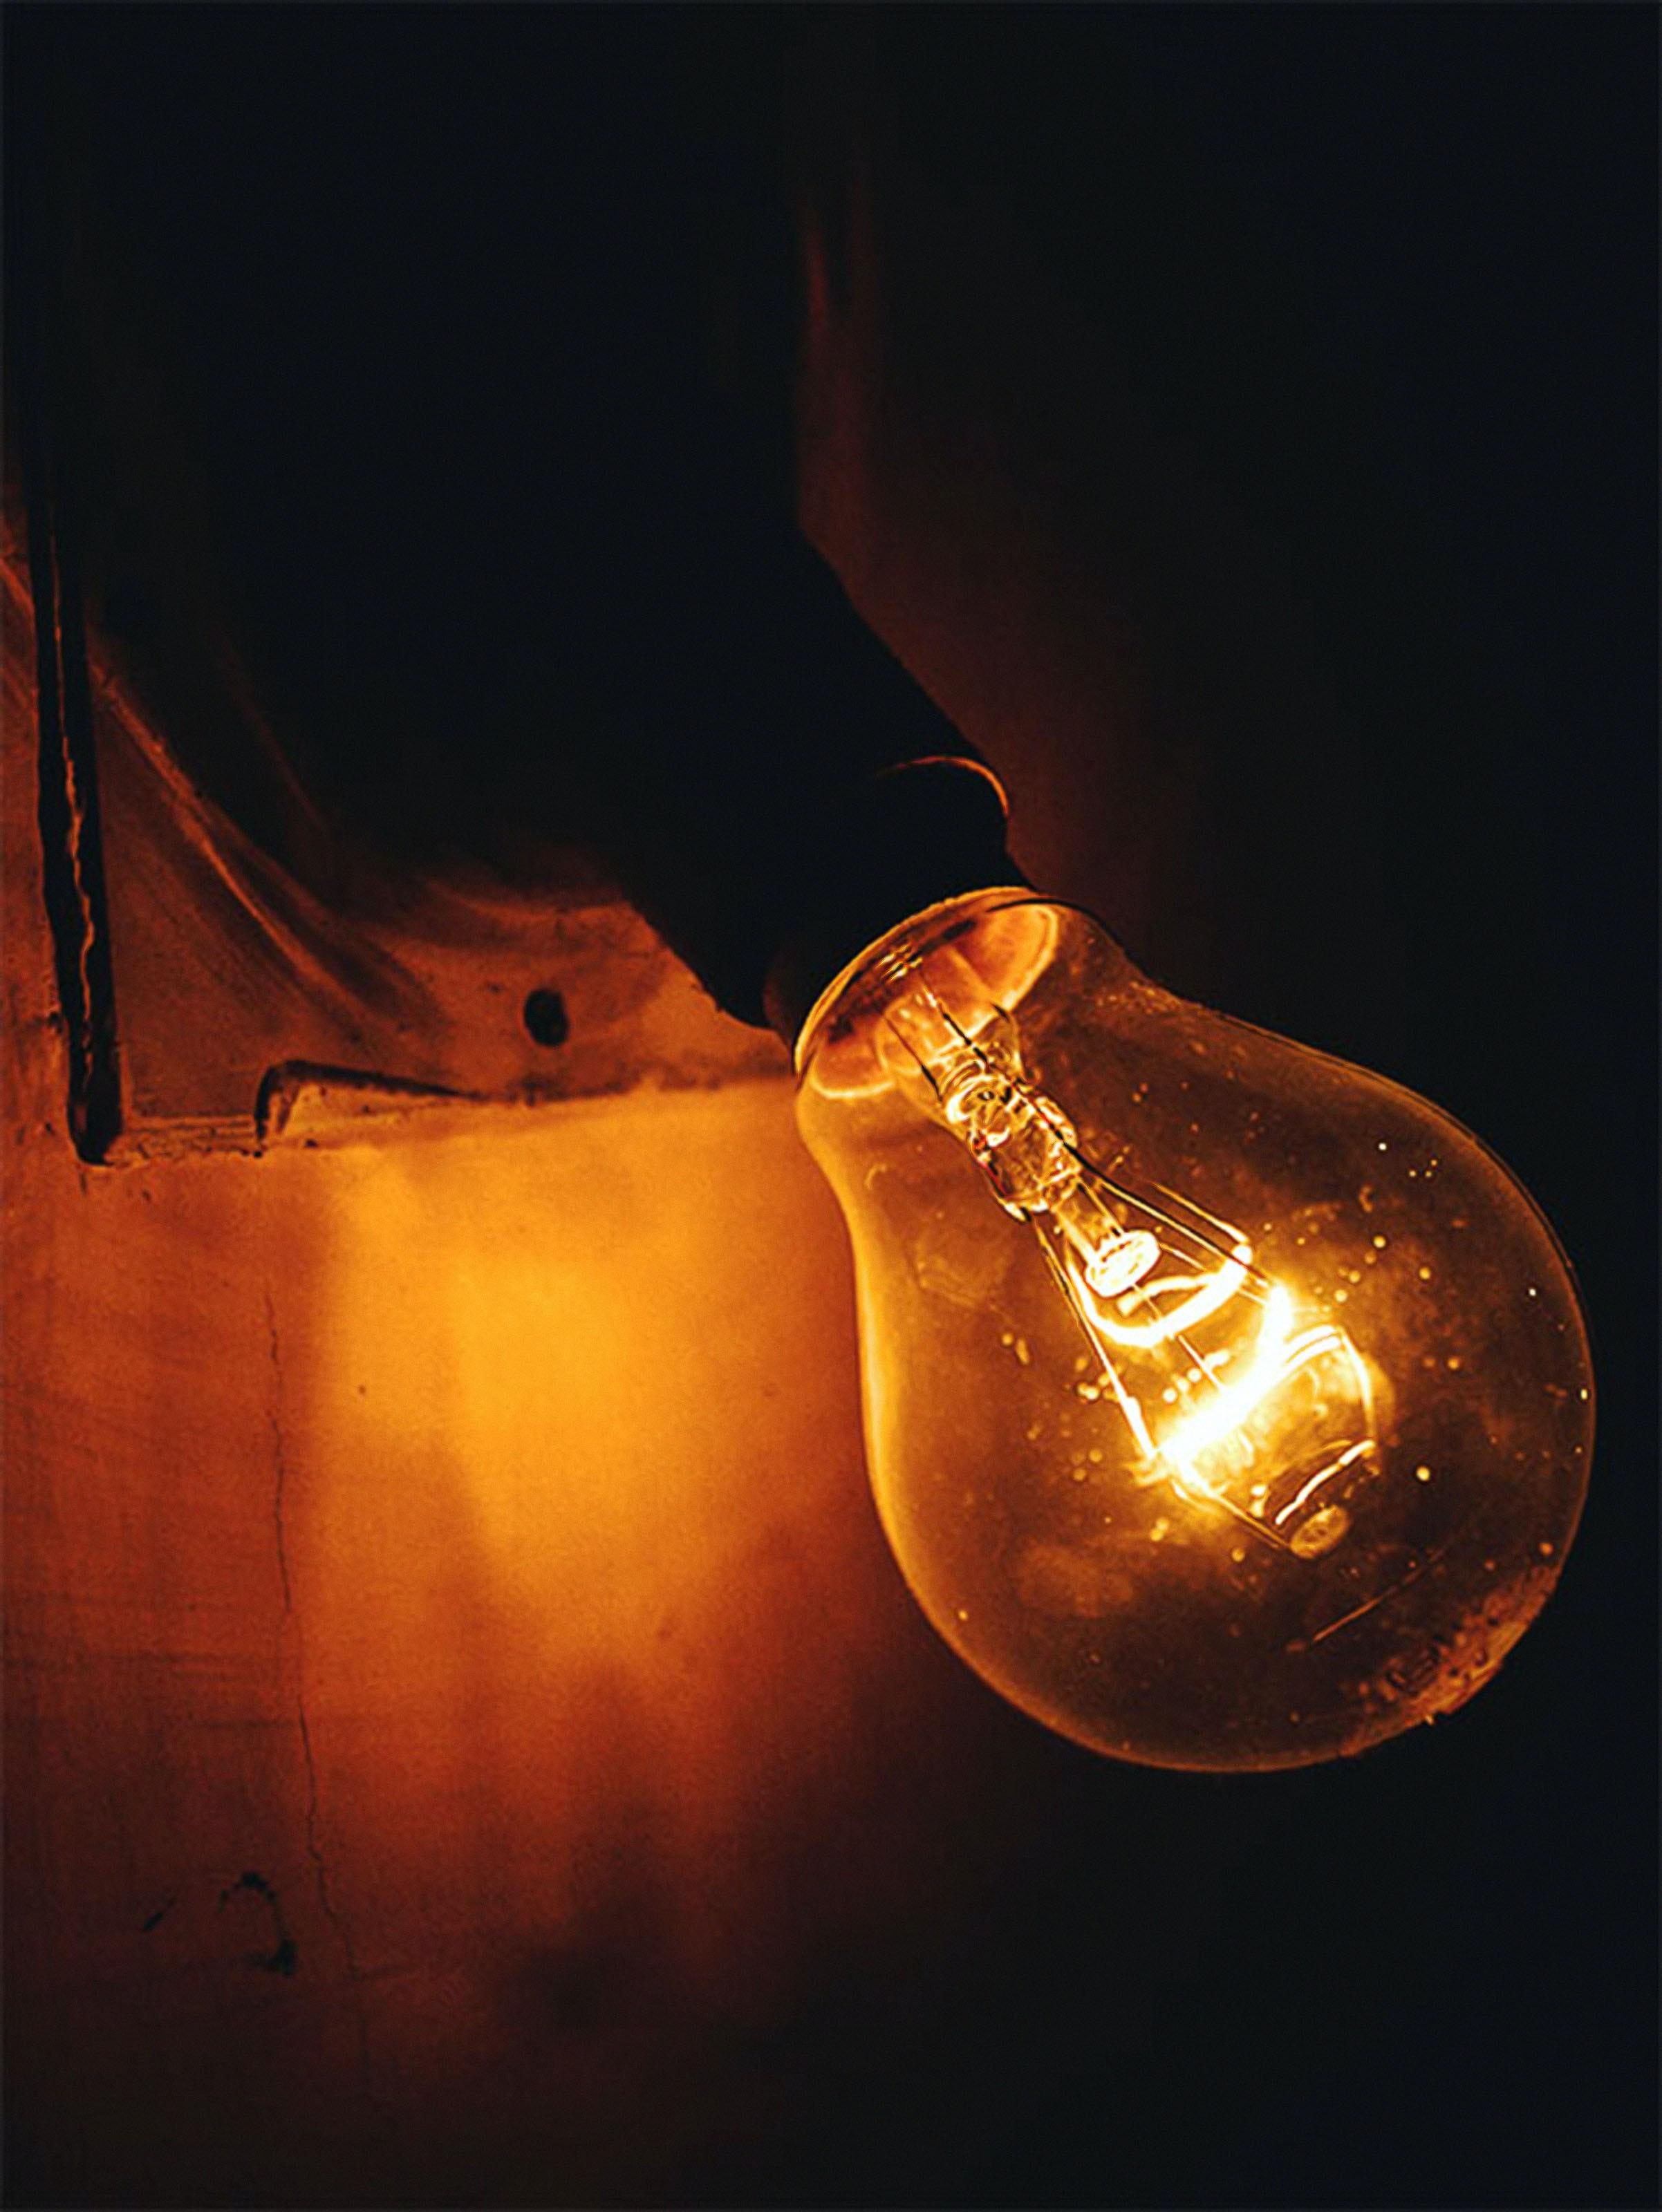 bulb fluorescent products compact tube bulbs daylight light watt pack balanced photography spiral design